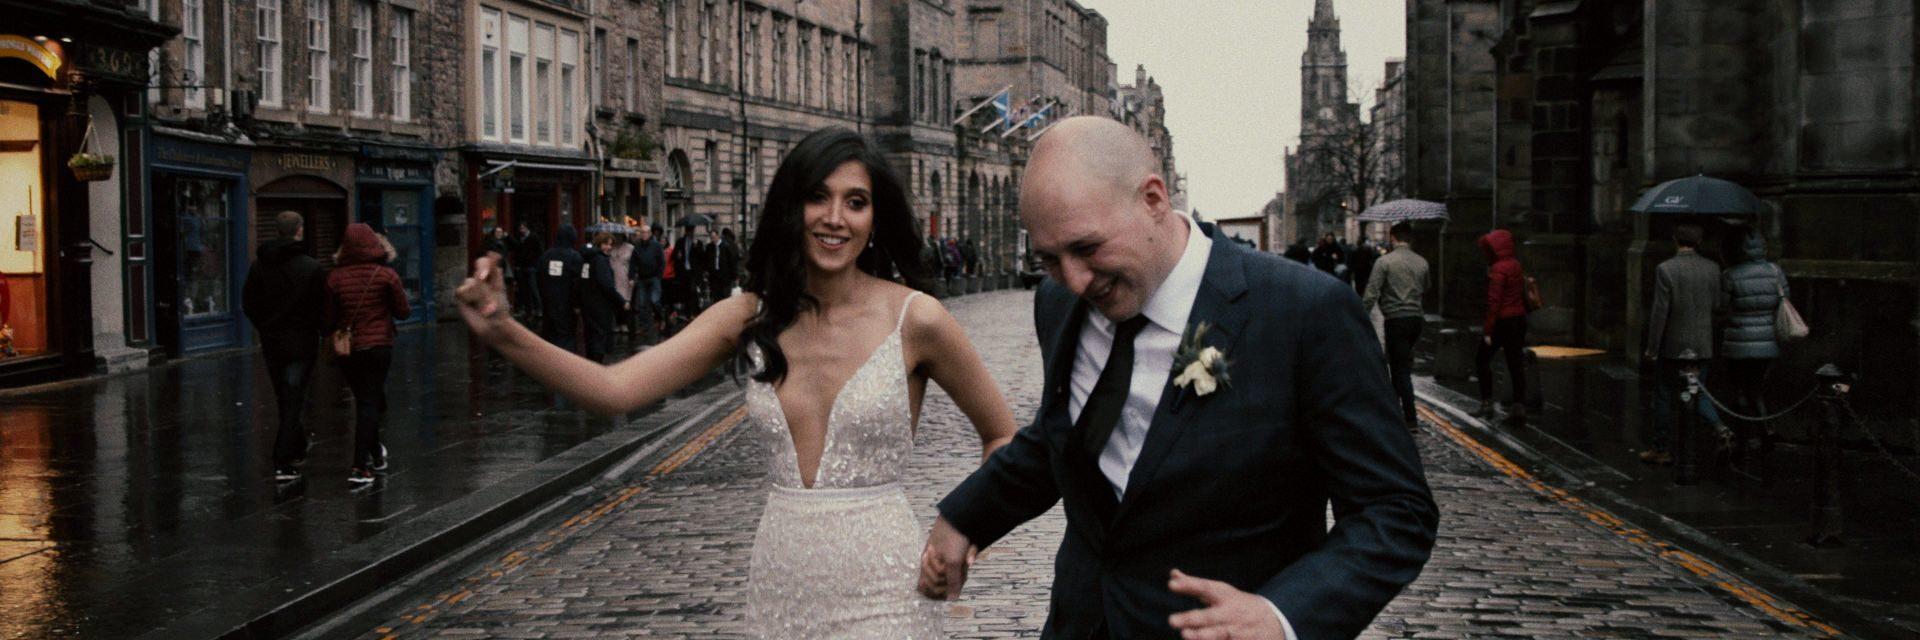 Copenhagen-wedding-videographer-cinemate-films-04